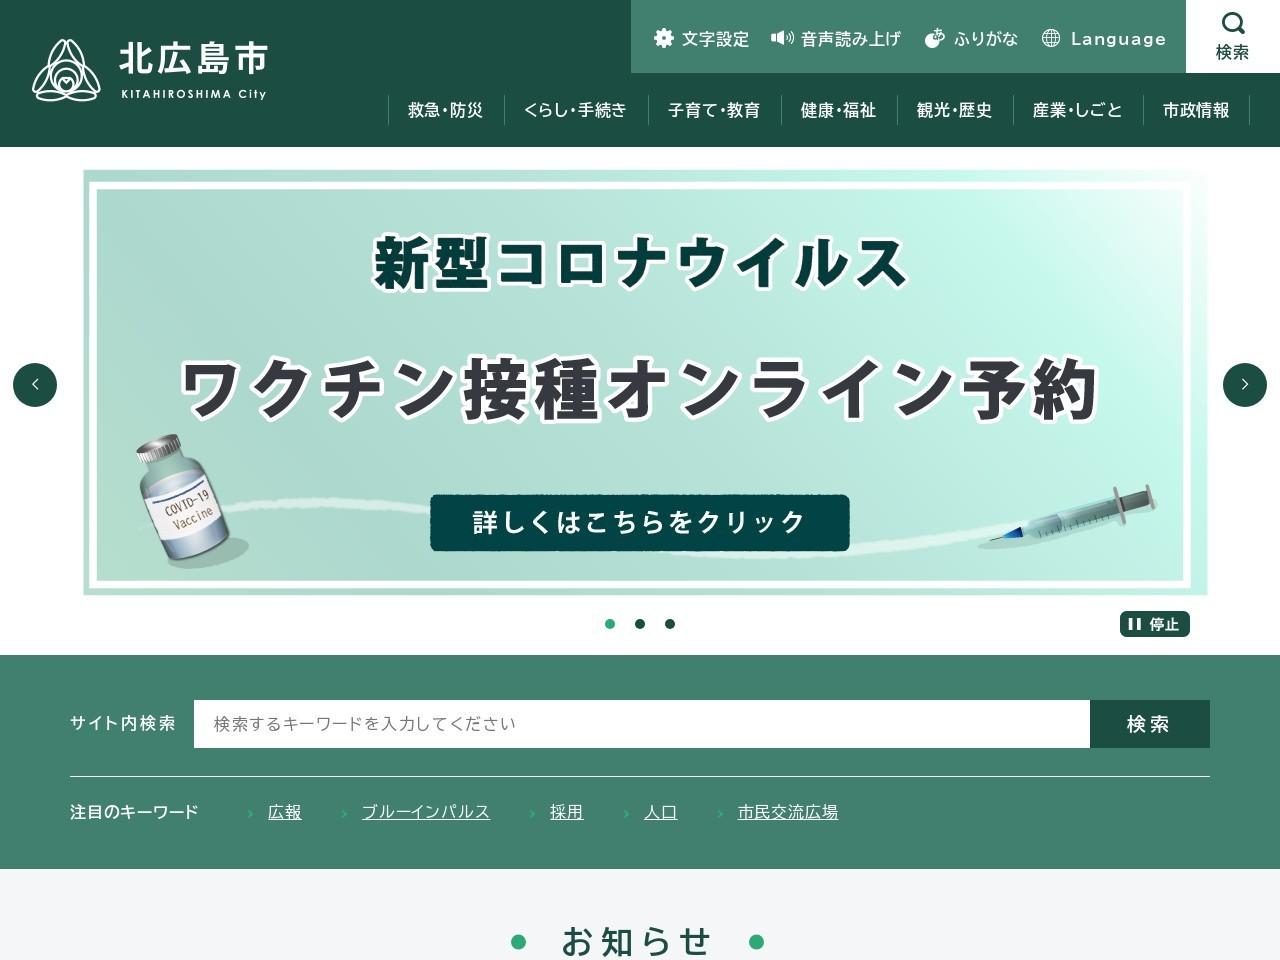 http://www.city.kitahiroshima.hokkaido.jp/hotnews/detail/00130740.html